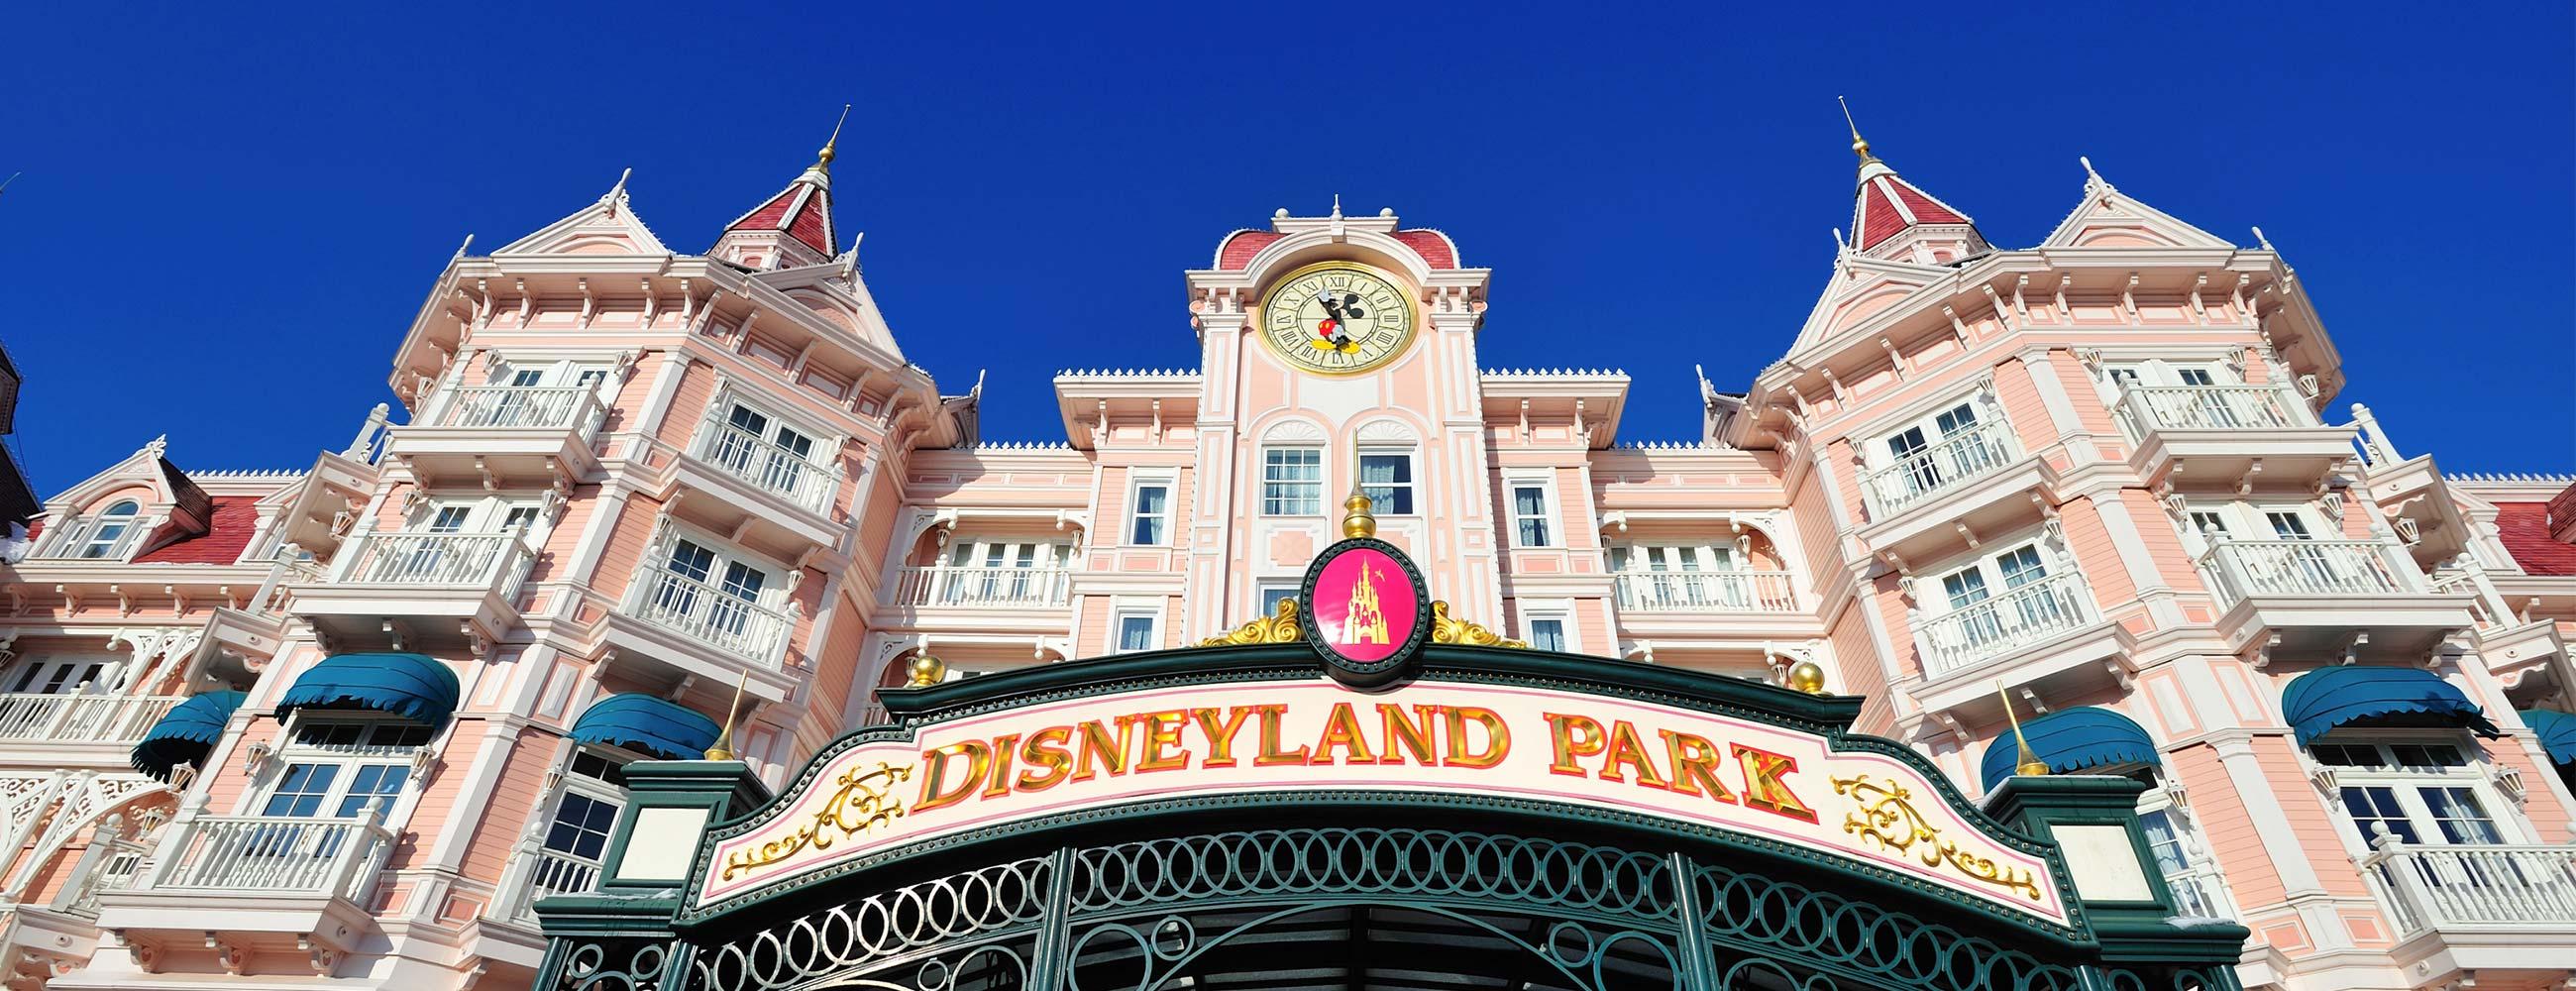 Hotel Cheyenne - New Texas Rooms - Disneyland Paris Disneyland hotel paris pictures